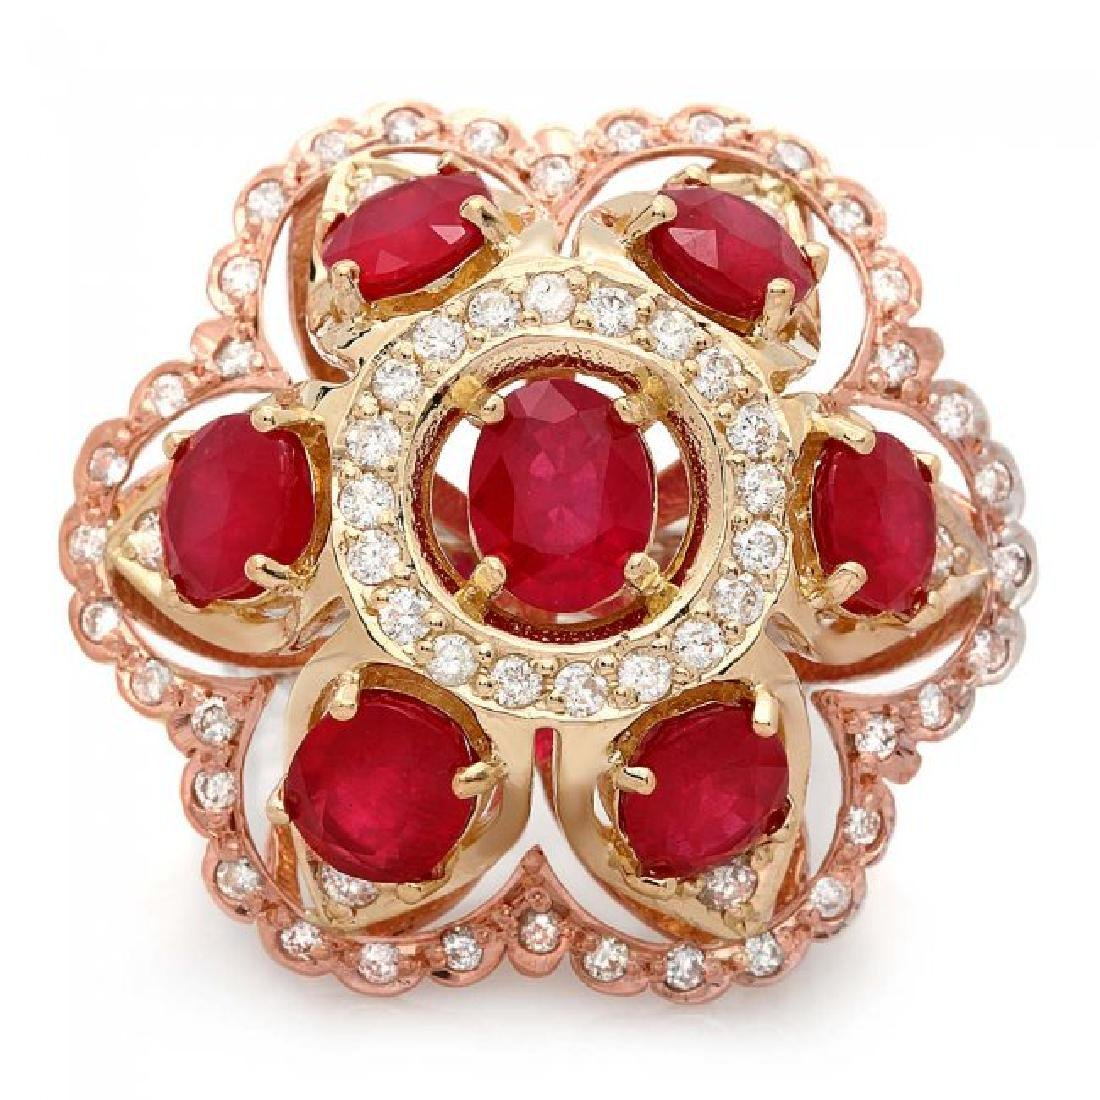 14k Gold 12.00ct Ruby 1.35ct Diamond Ring - 3